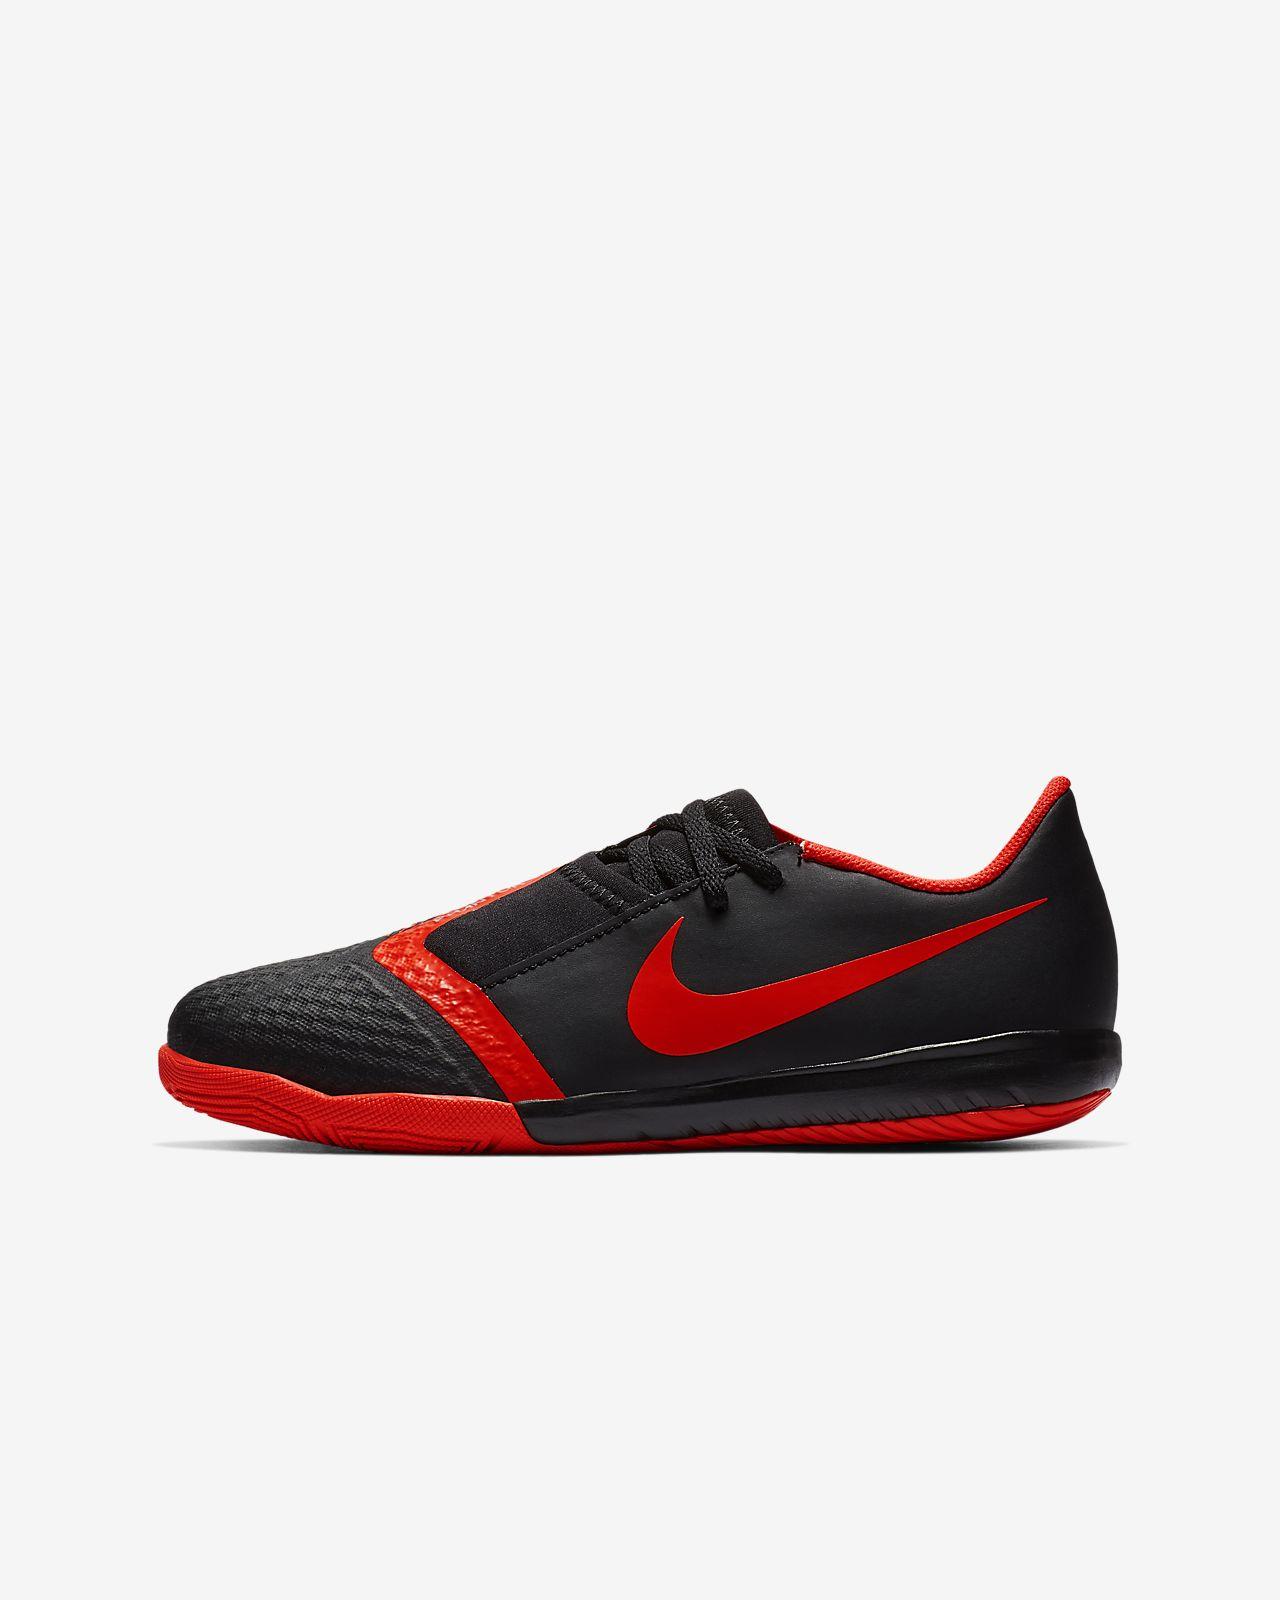 sale retailer cc80a d0fa7 Older Kids  Indoor Court Football Boot. Nike Jr. Phantom Venom Academy IC